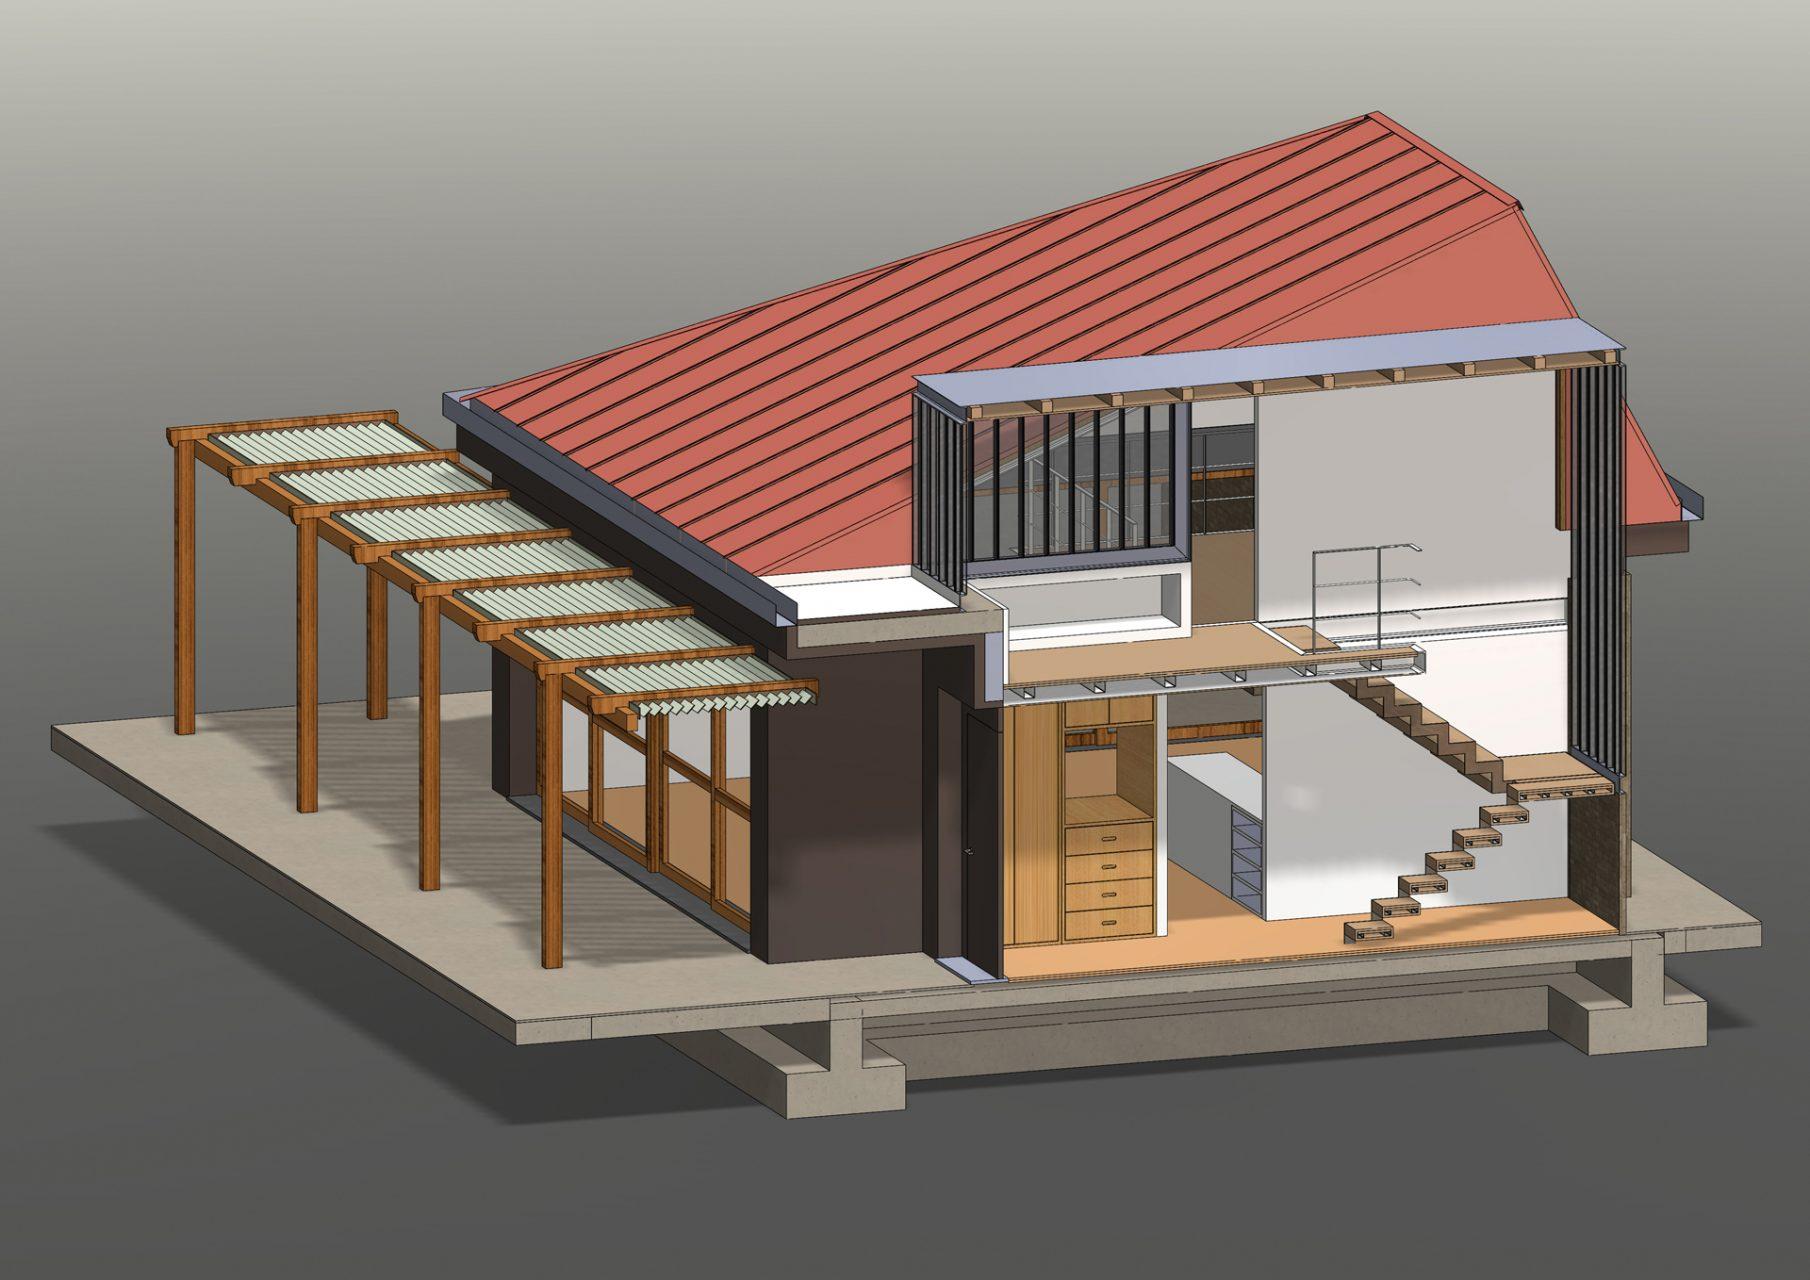 KL HOUSE 11 - axonometric section - thru staircase F